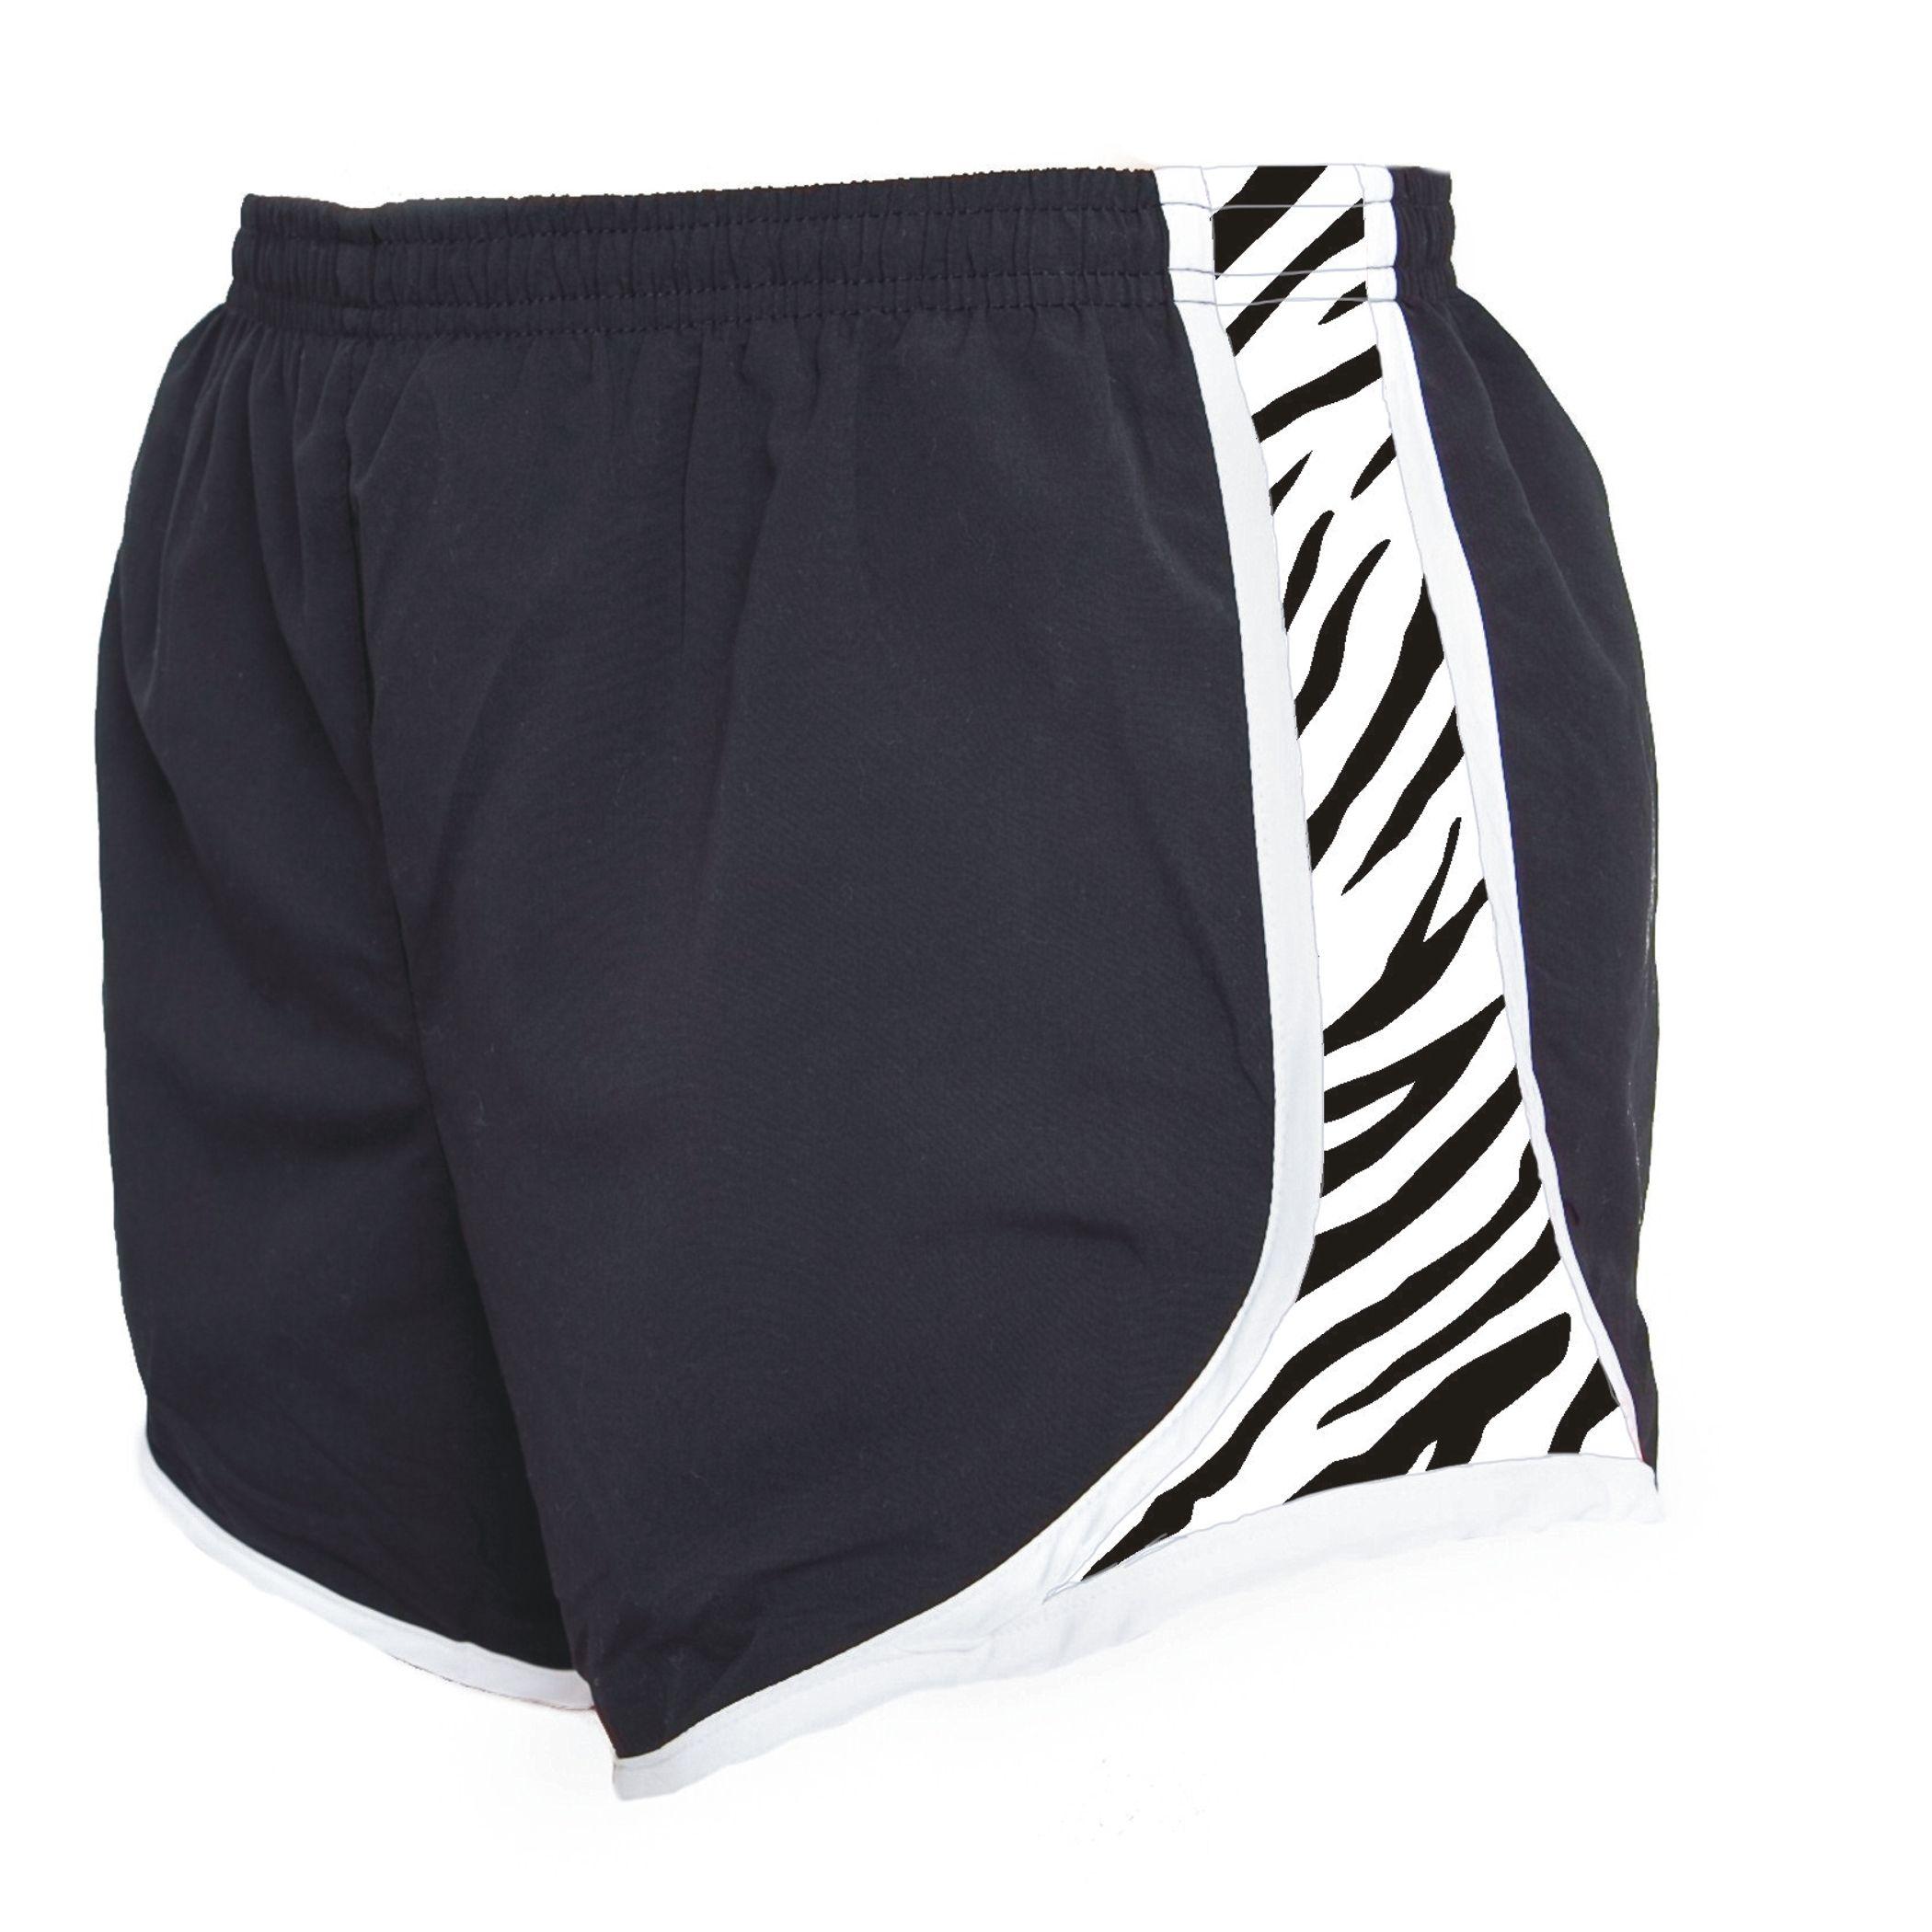 Black/WhiteZebra Running Shorts